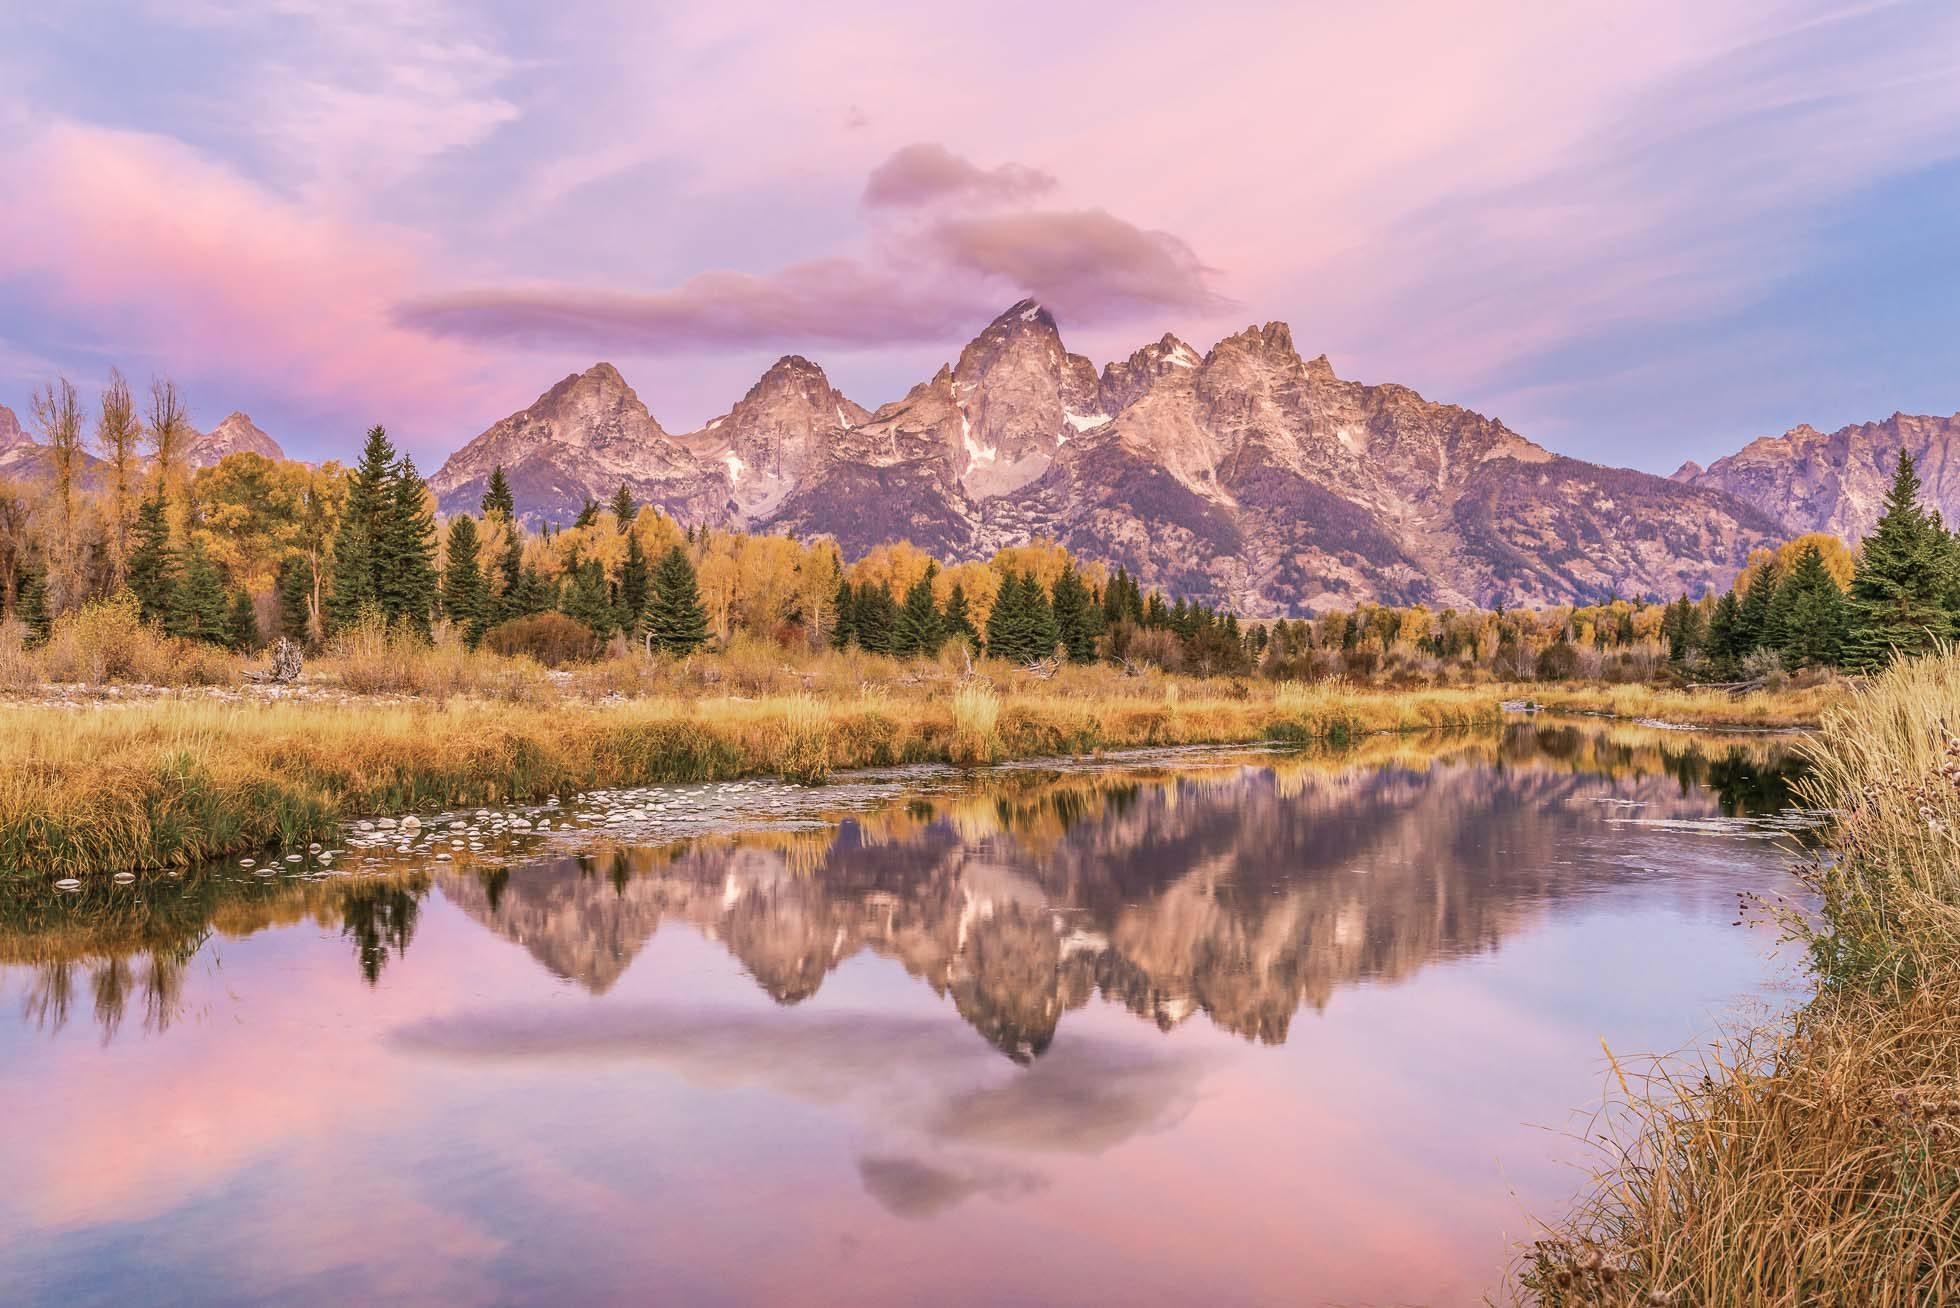 landscape-of-tetons-at-sunrise-reflected-in-snake-river